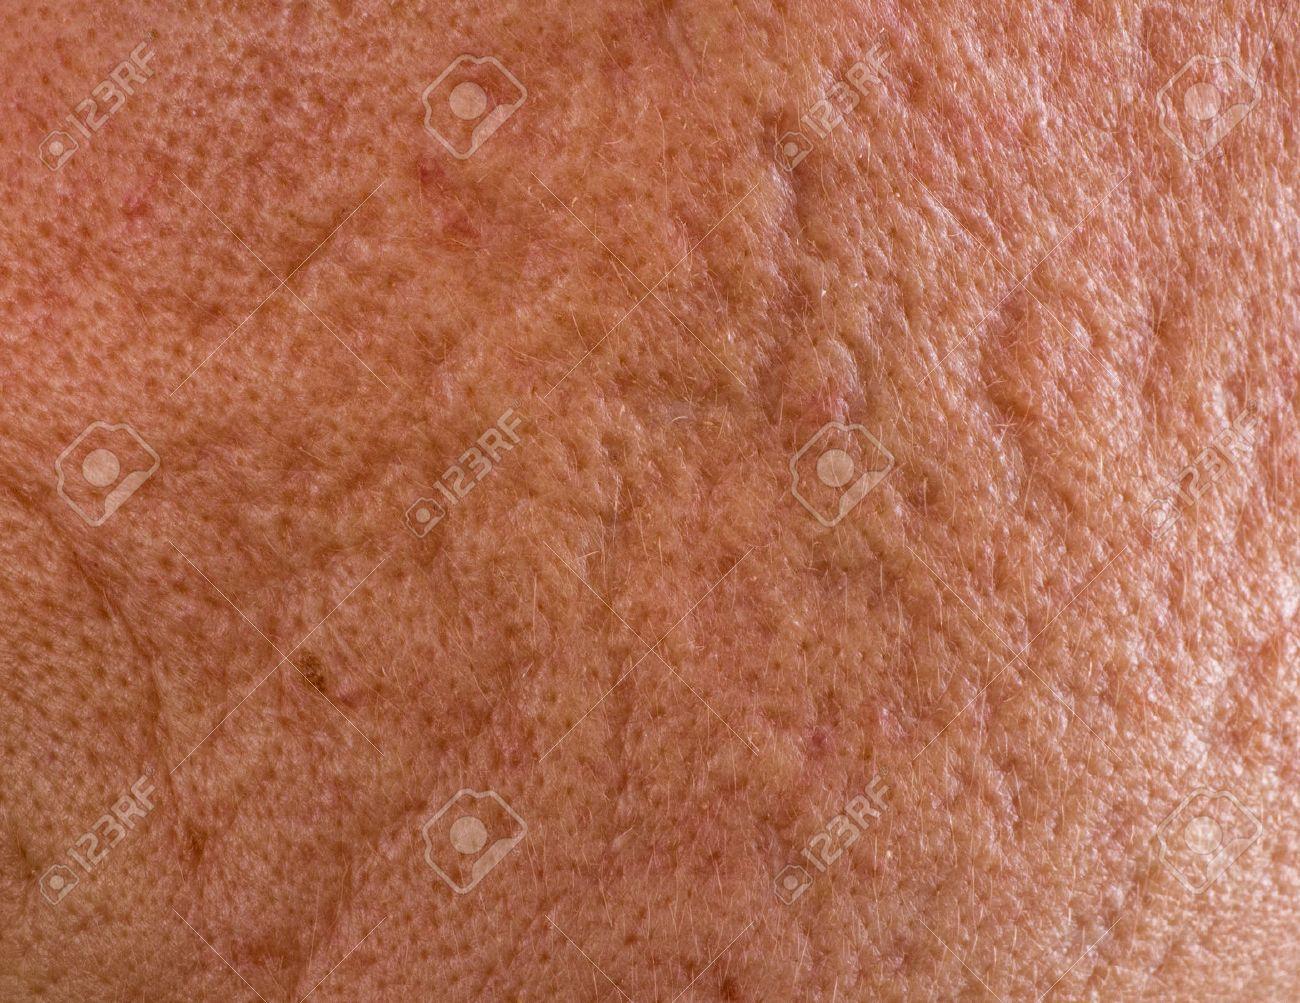 http://n3.datasn.io/data/api/v1/n3zm/image_of_skin_disease_5/by_table/skin_disease_image_download_access/fc/8a/82/1f/fc8a821f00ebdc7264a8f4667d7c9ad021748aa8.jpg